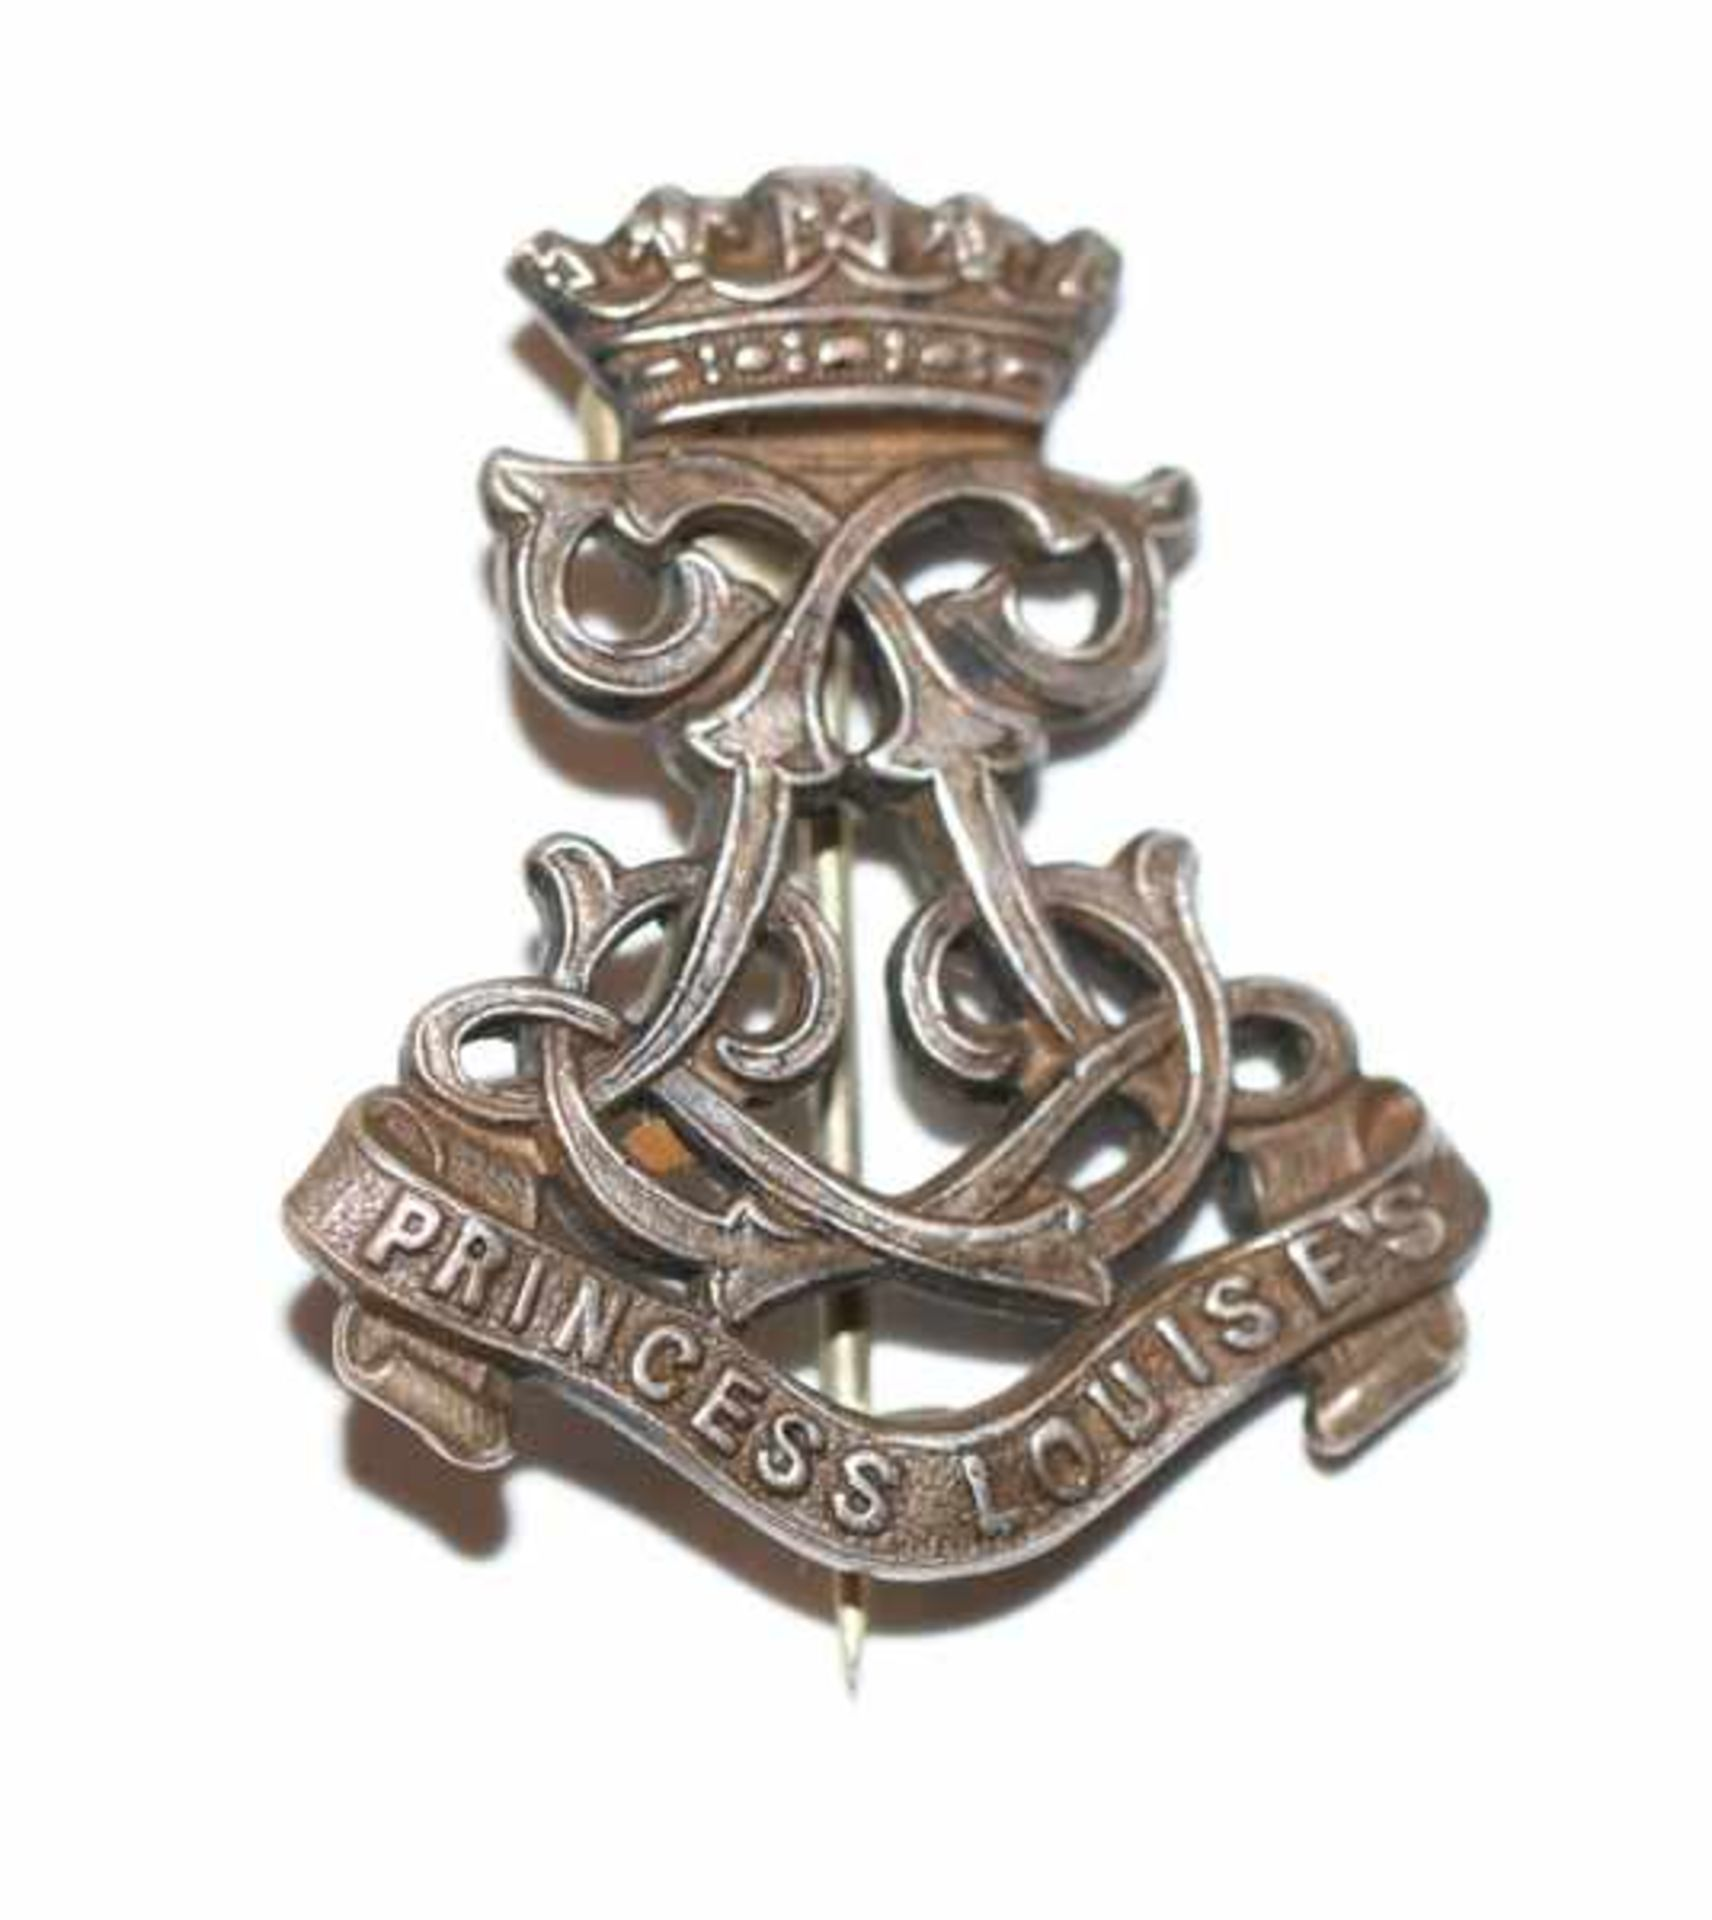 Los 102 - Abzeichen '4th Princess Louise Dragoon Guards' Kanada 1875-1965